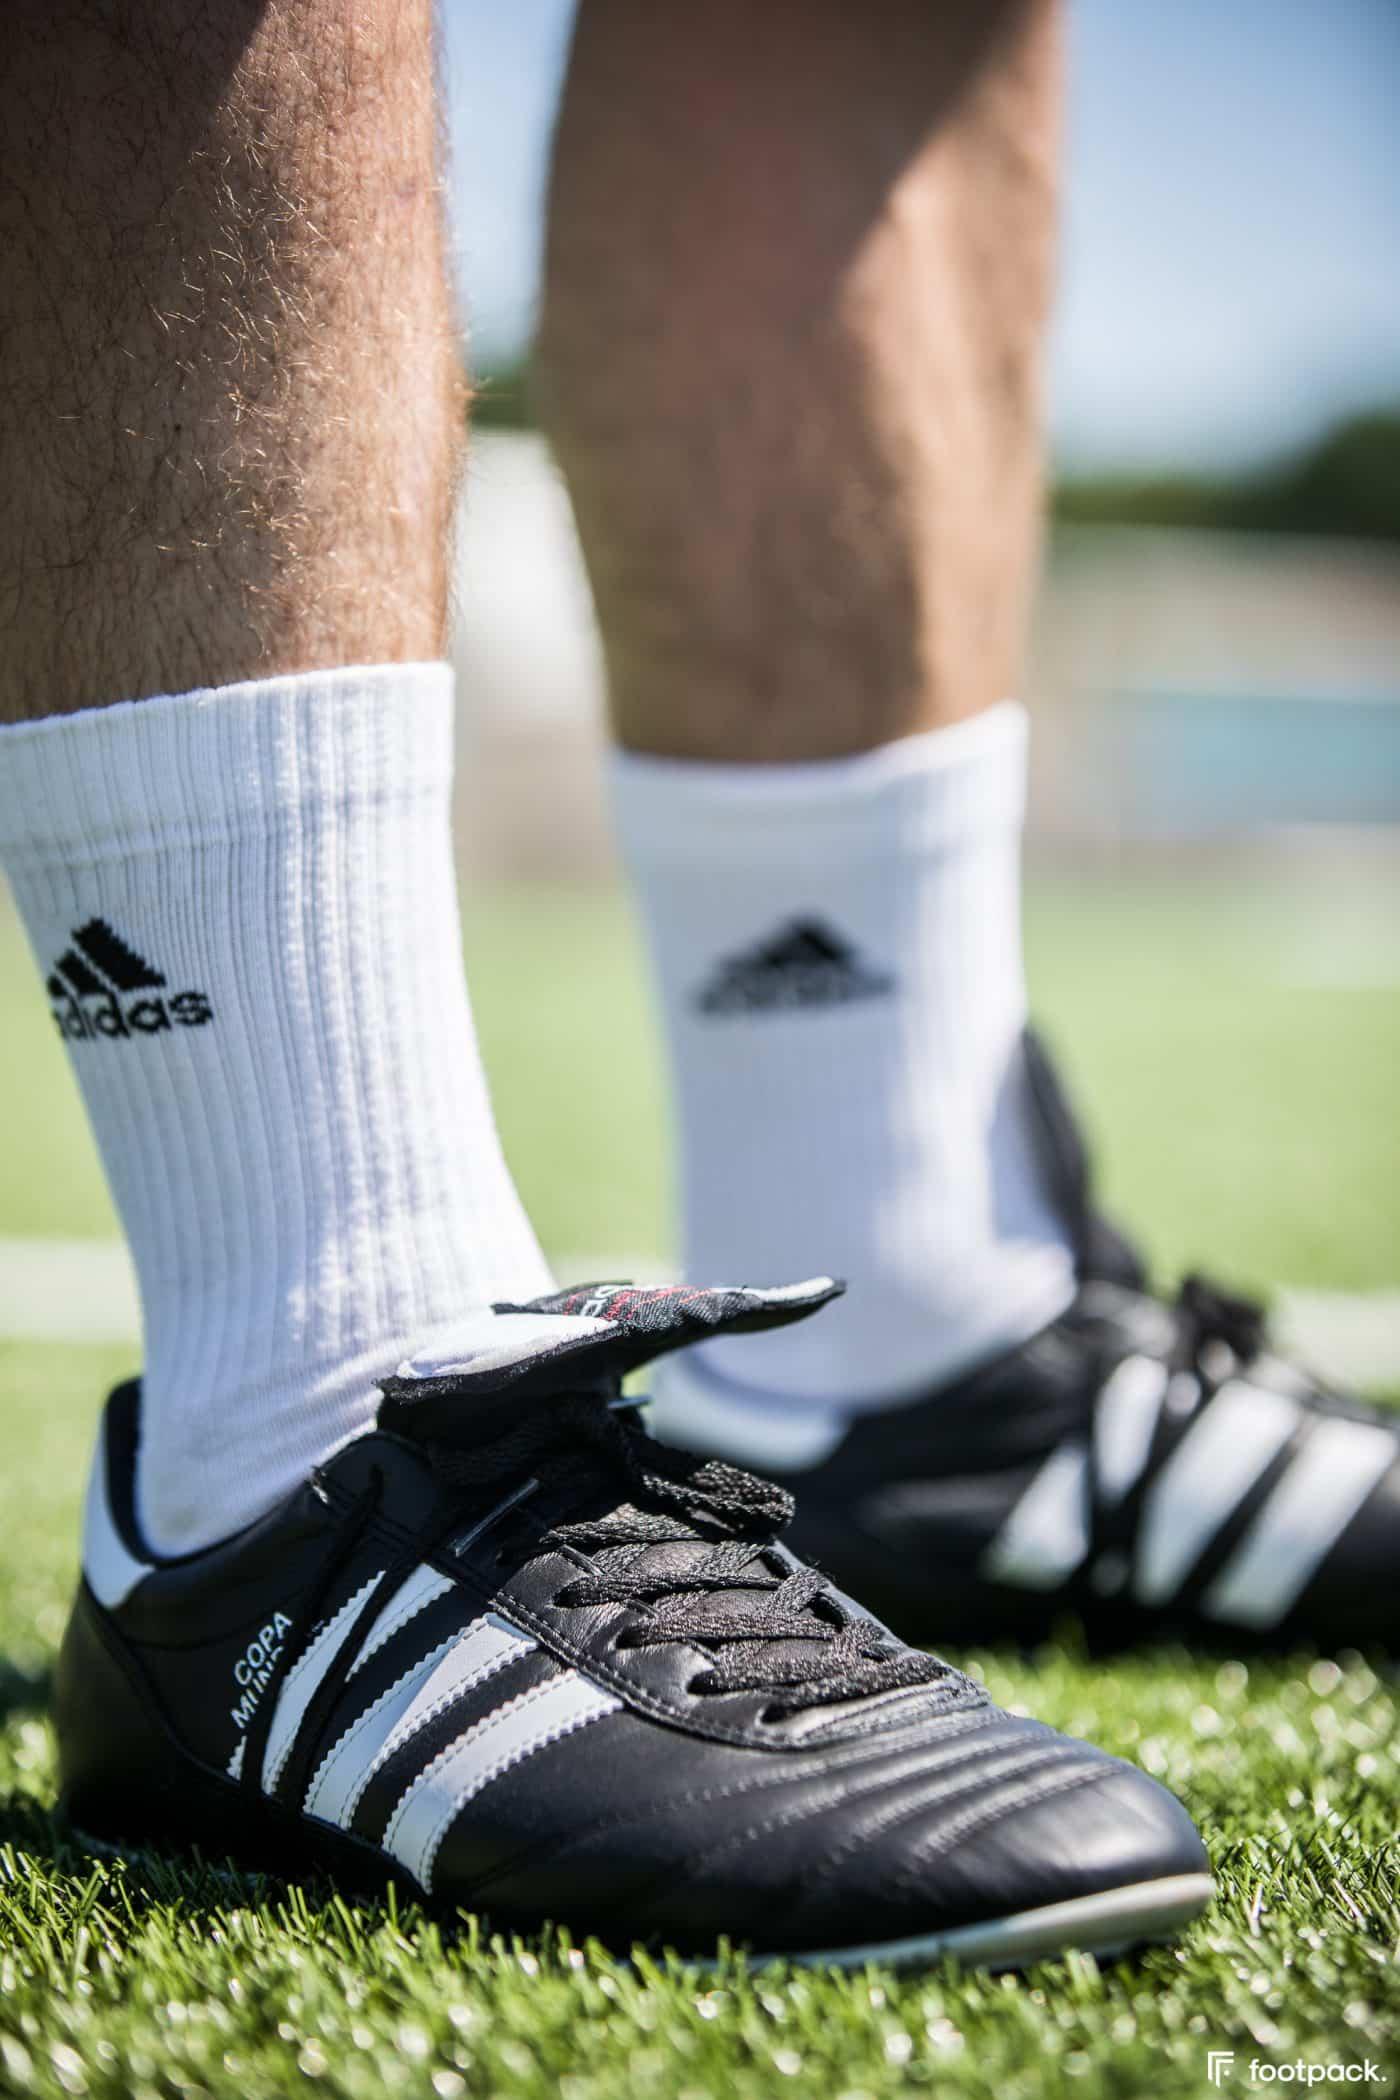 test-adidas-copa-mundial-footpack-3